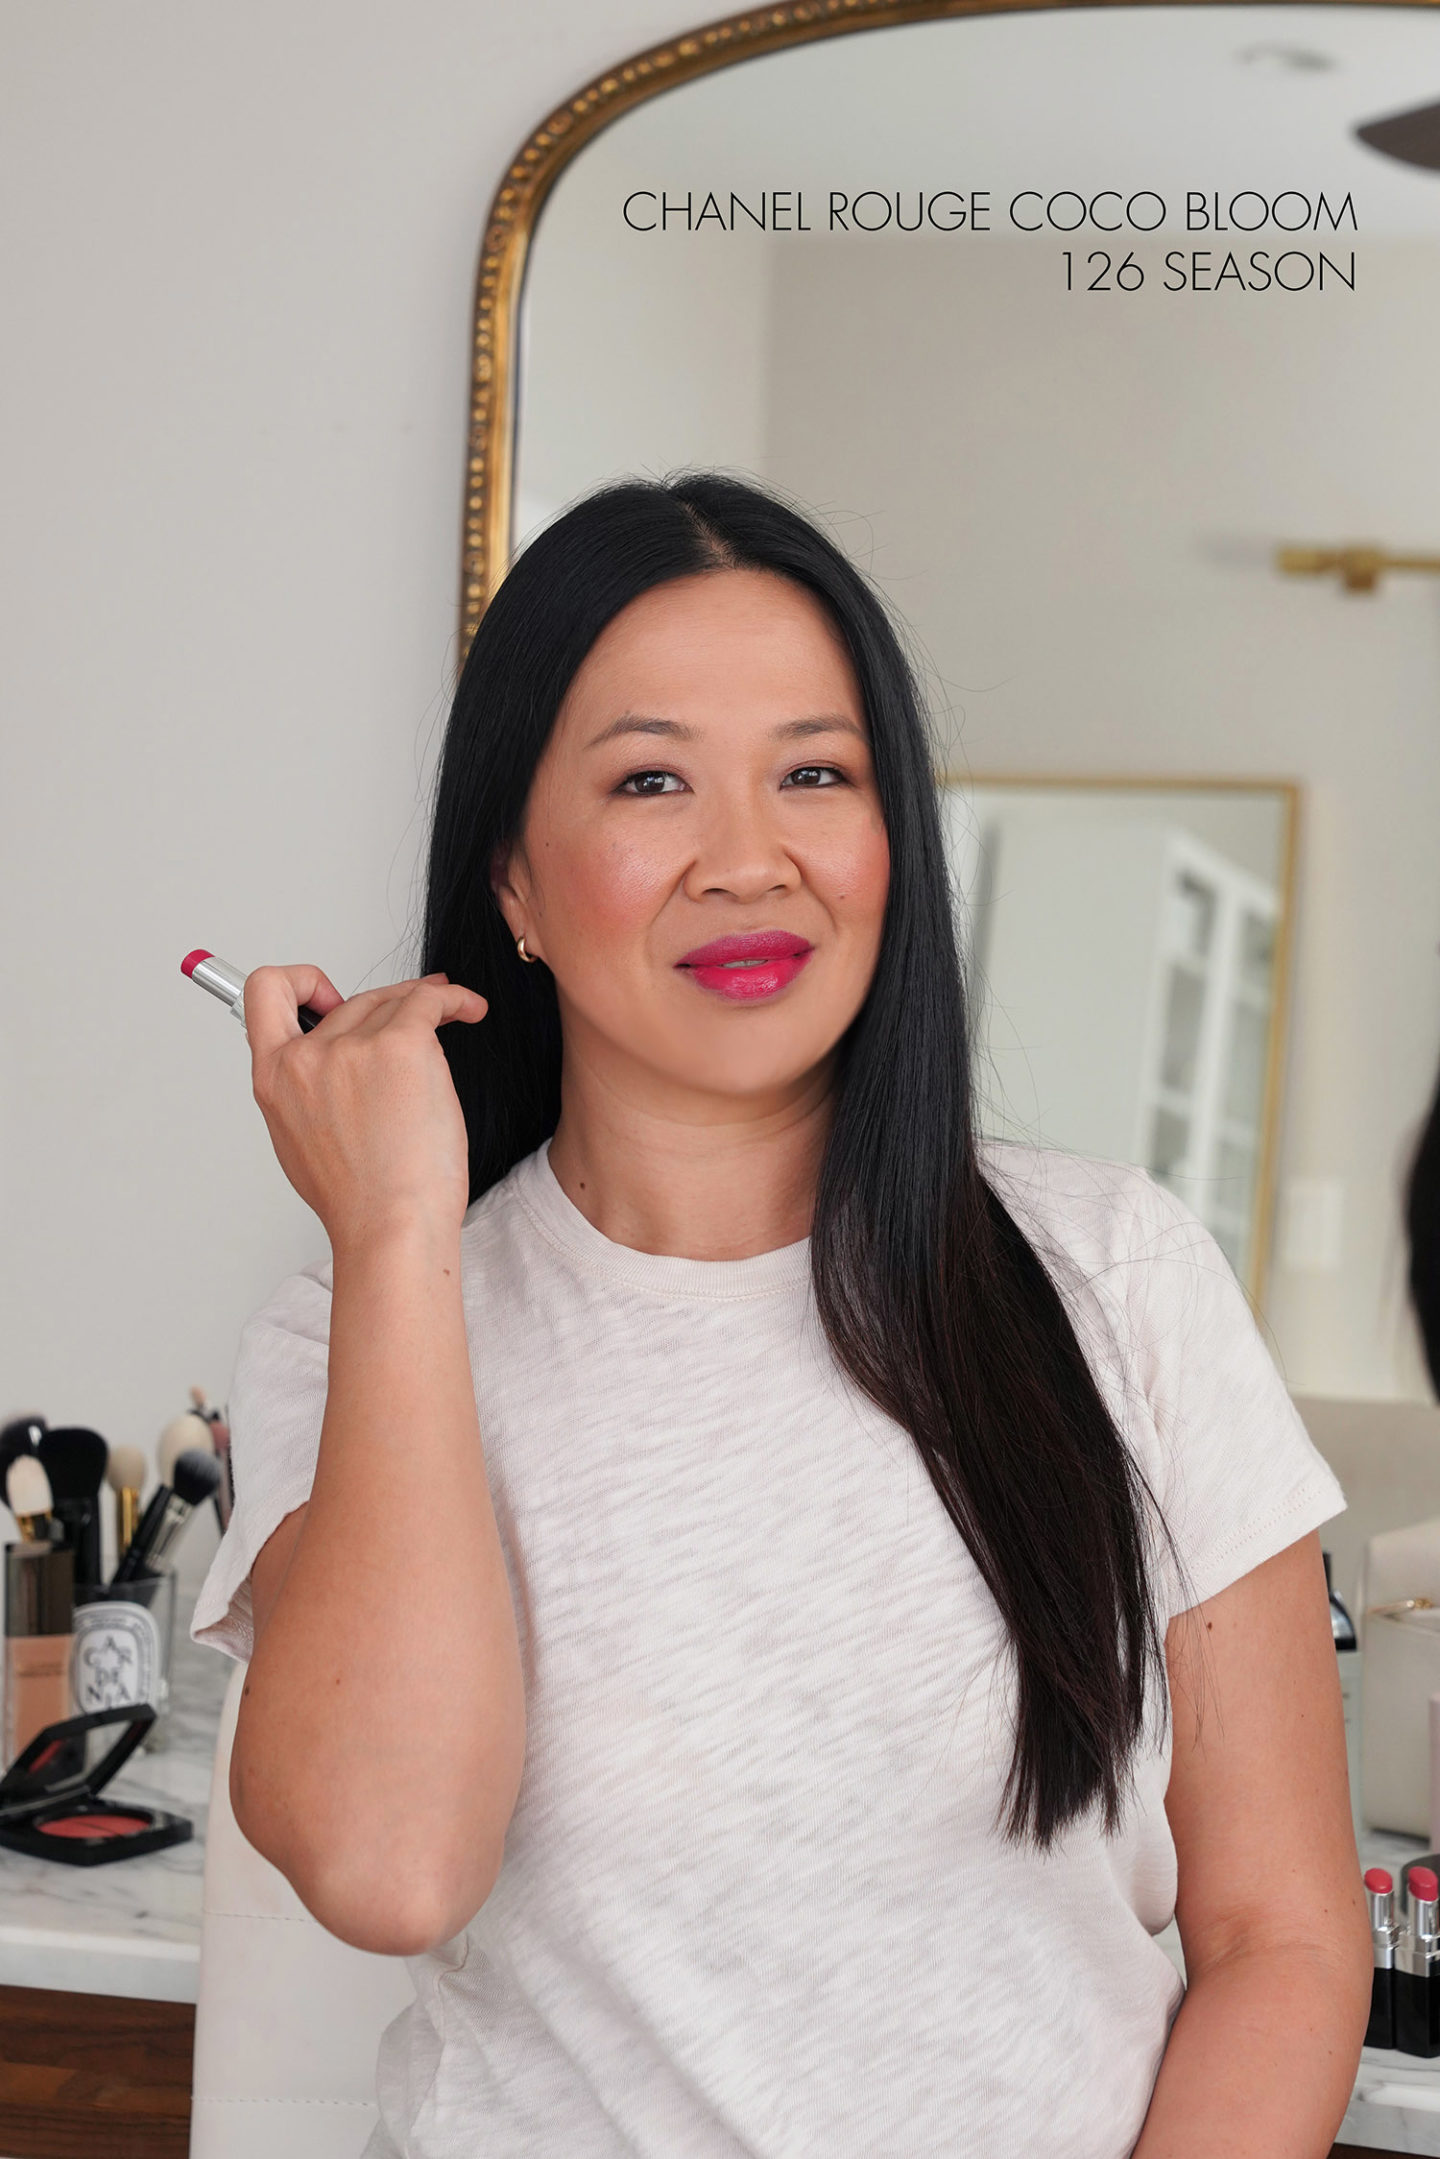 Chanel Rouge Coco Bloom Hydrating Lipstick 126 Season